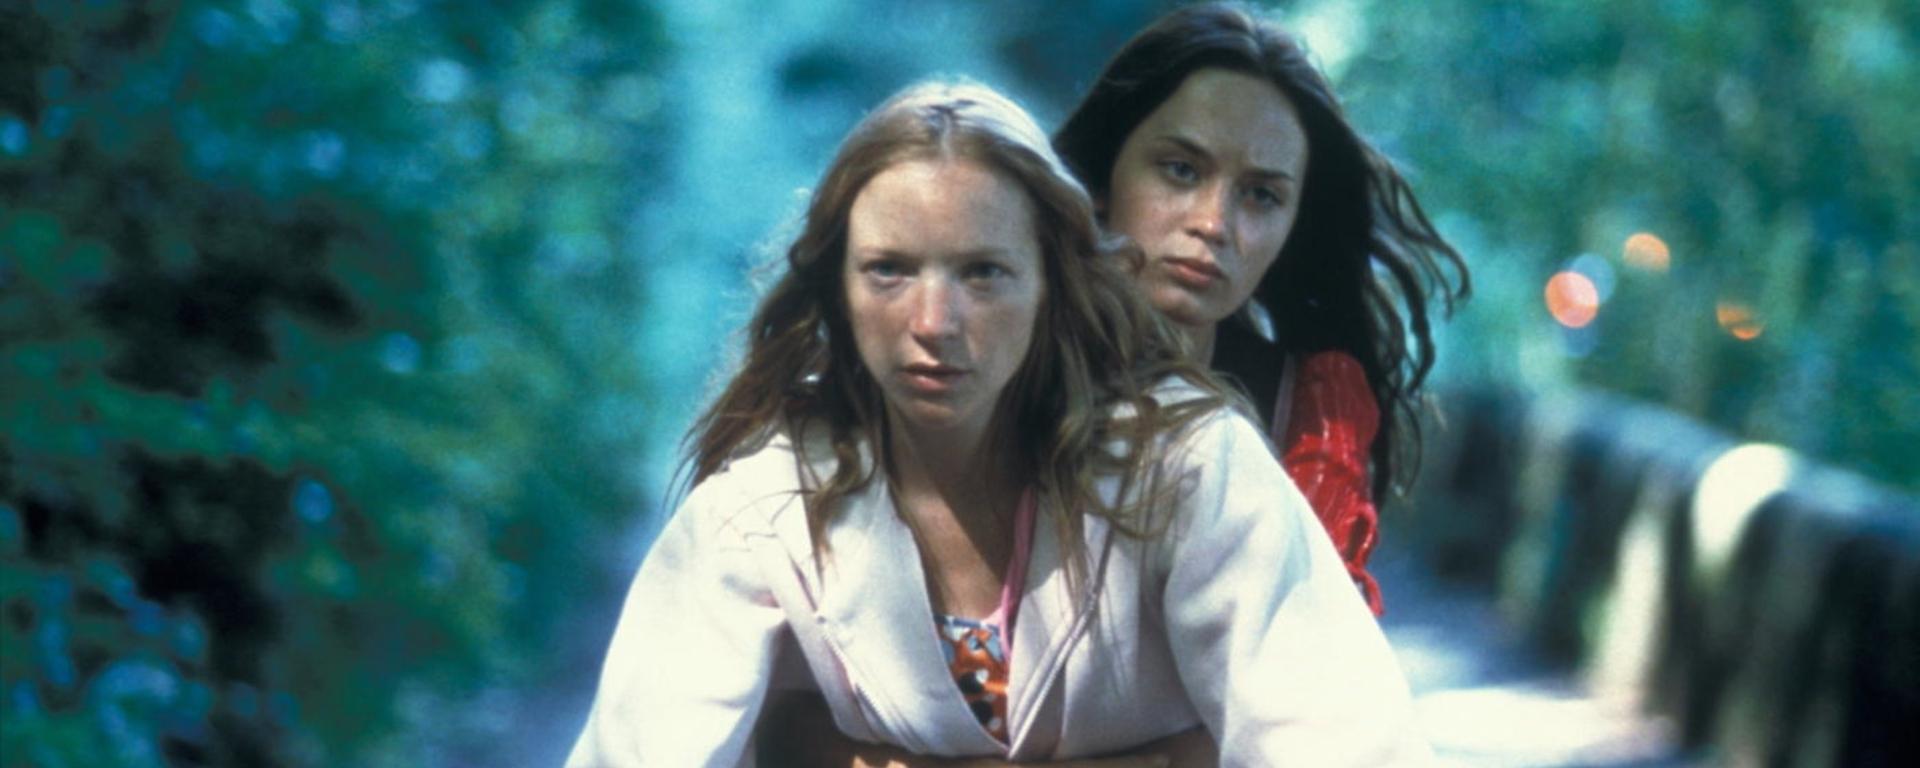 My Summer of Love - CineFatti